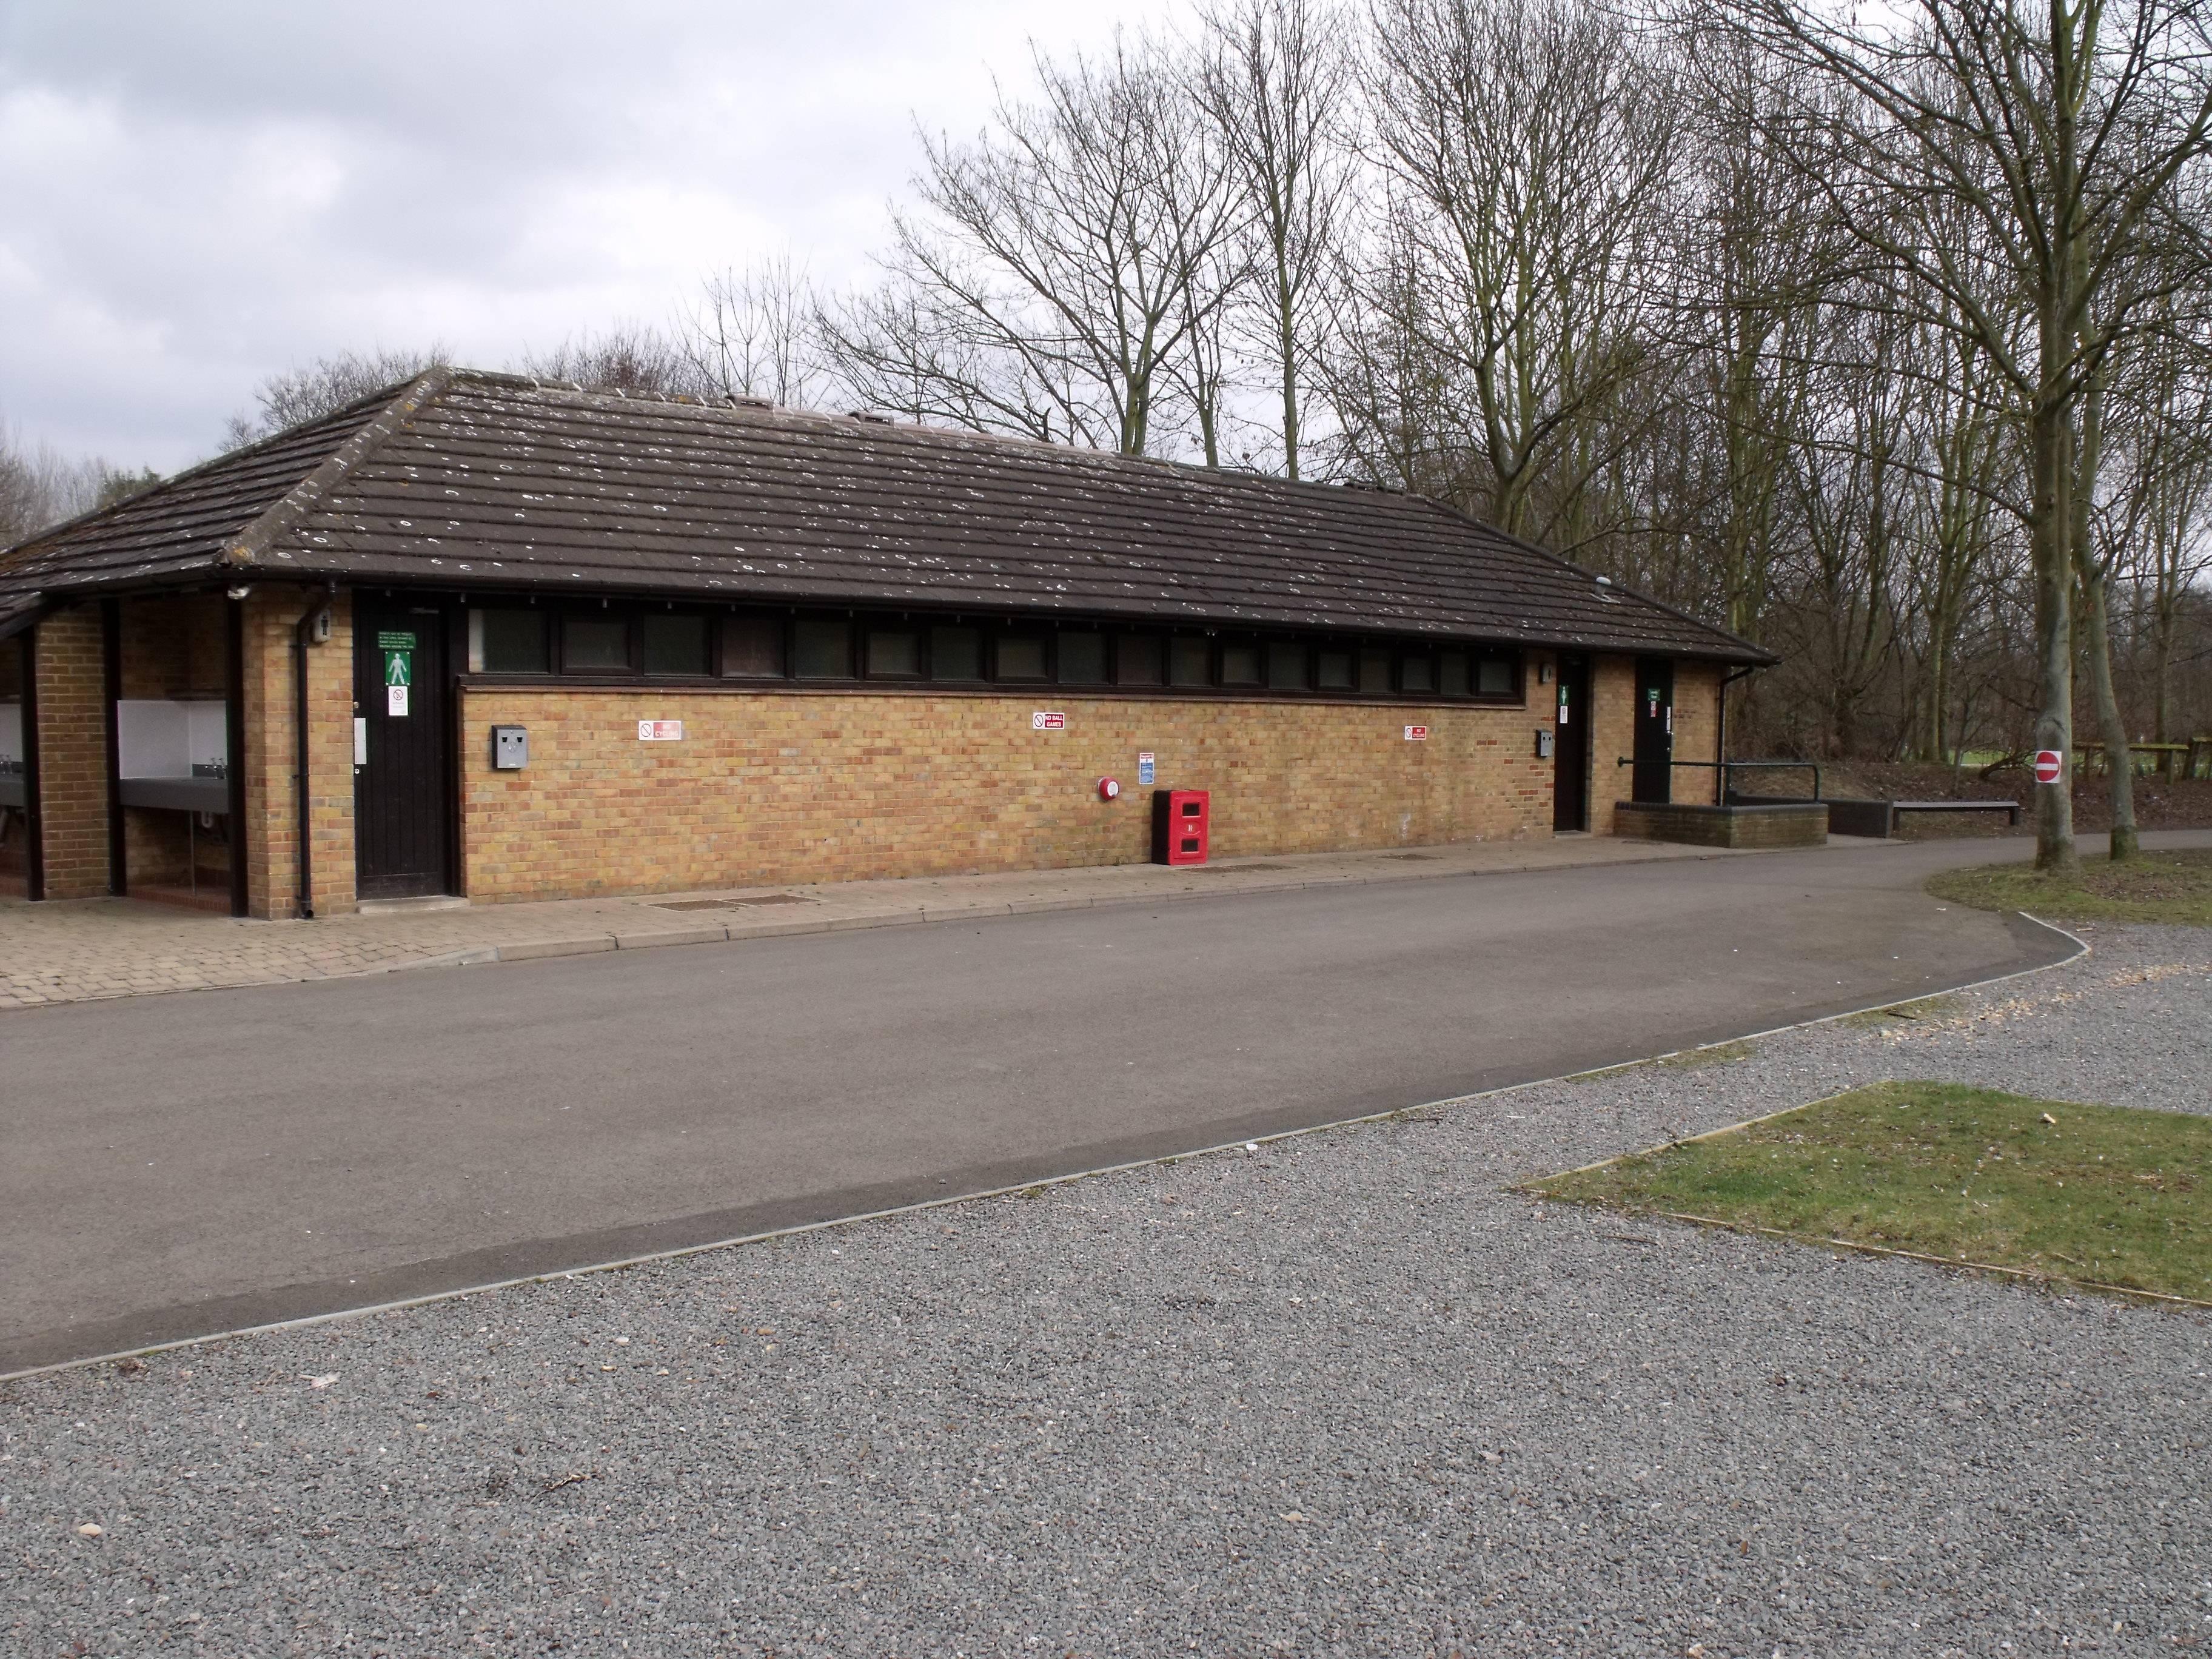 38471c5f7f0 File:Facilities Block, East site, Ferry Meadows Caravan Club Site -  geograph.org.uk - 1777350.jpg